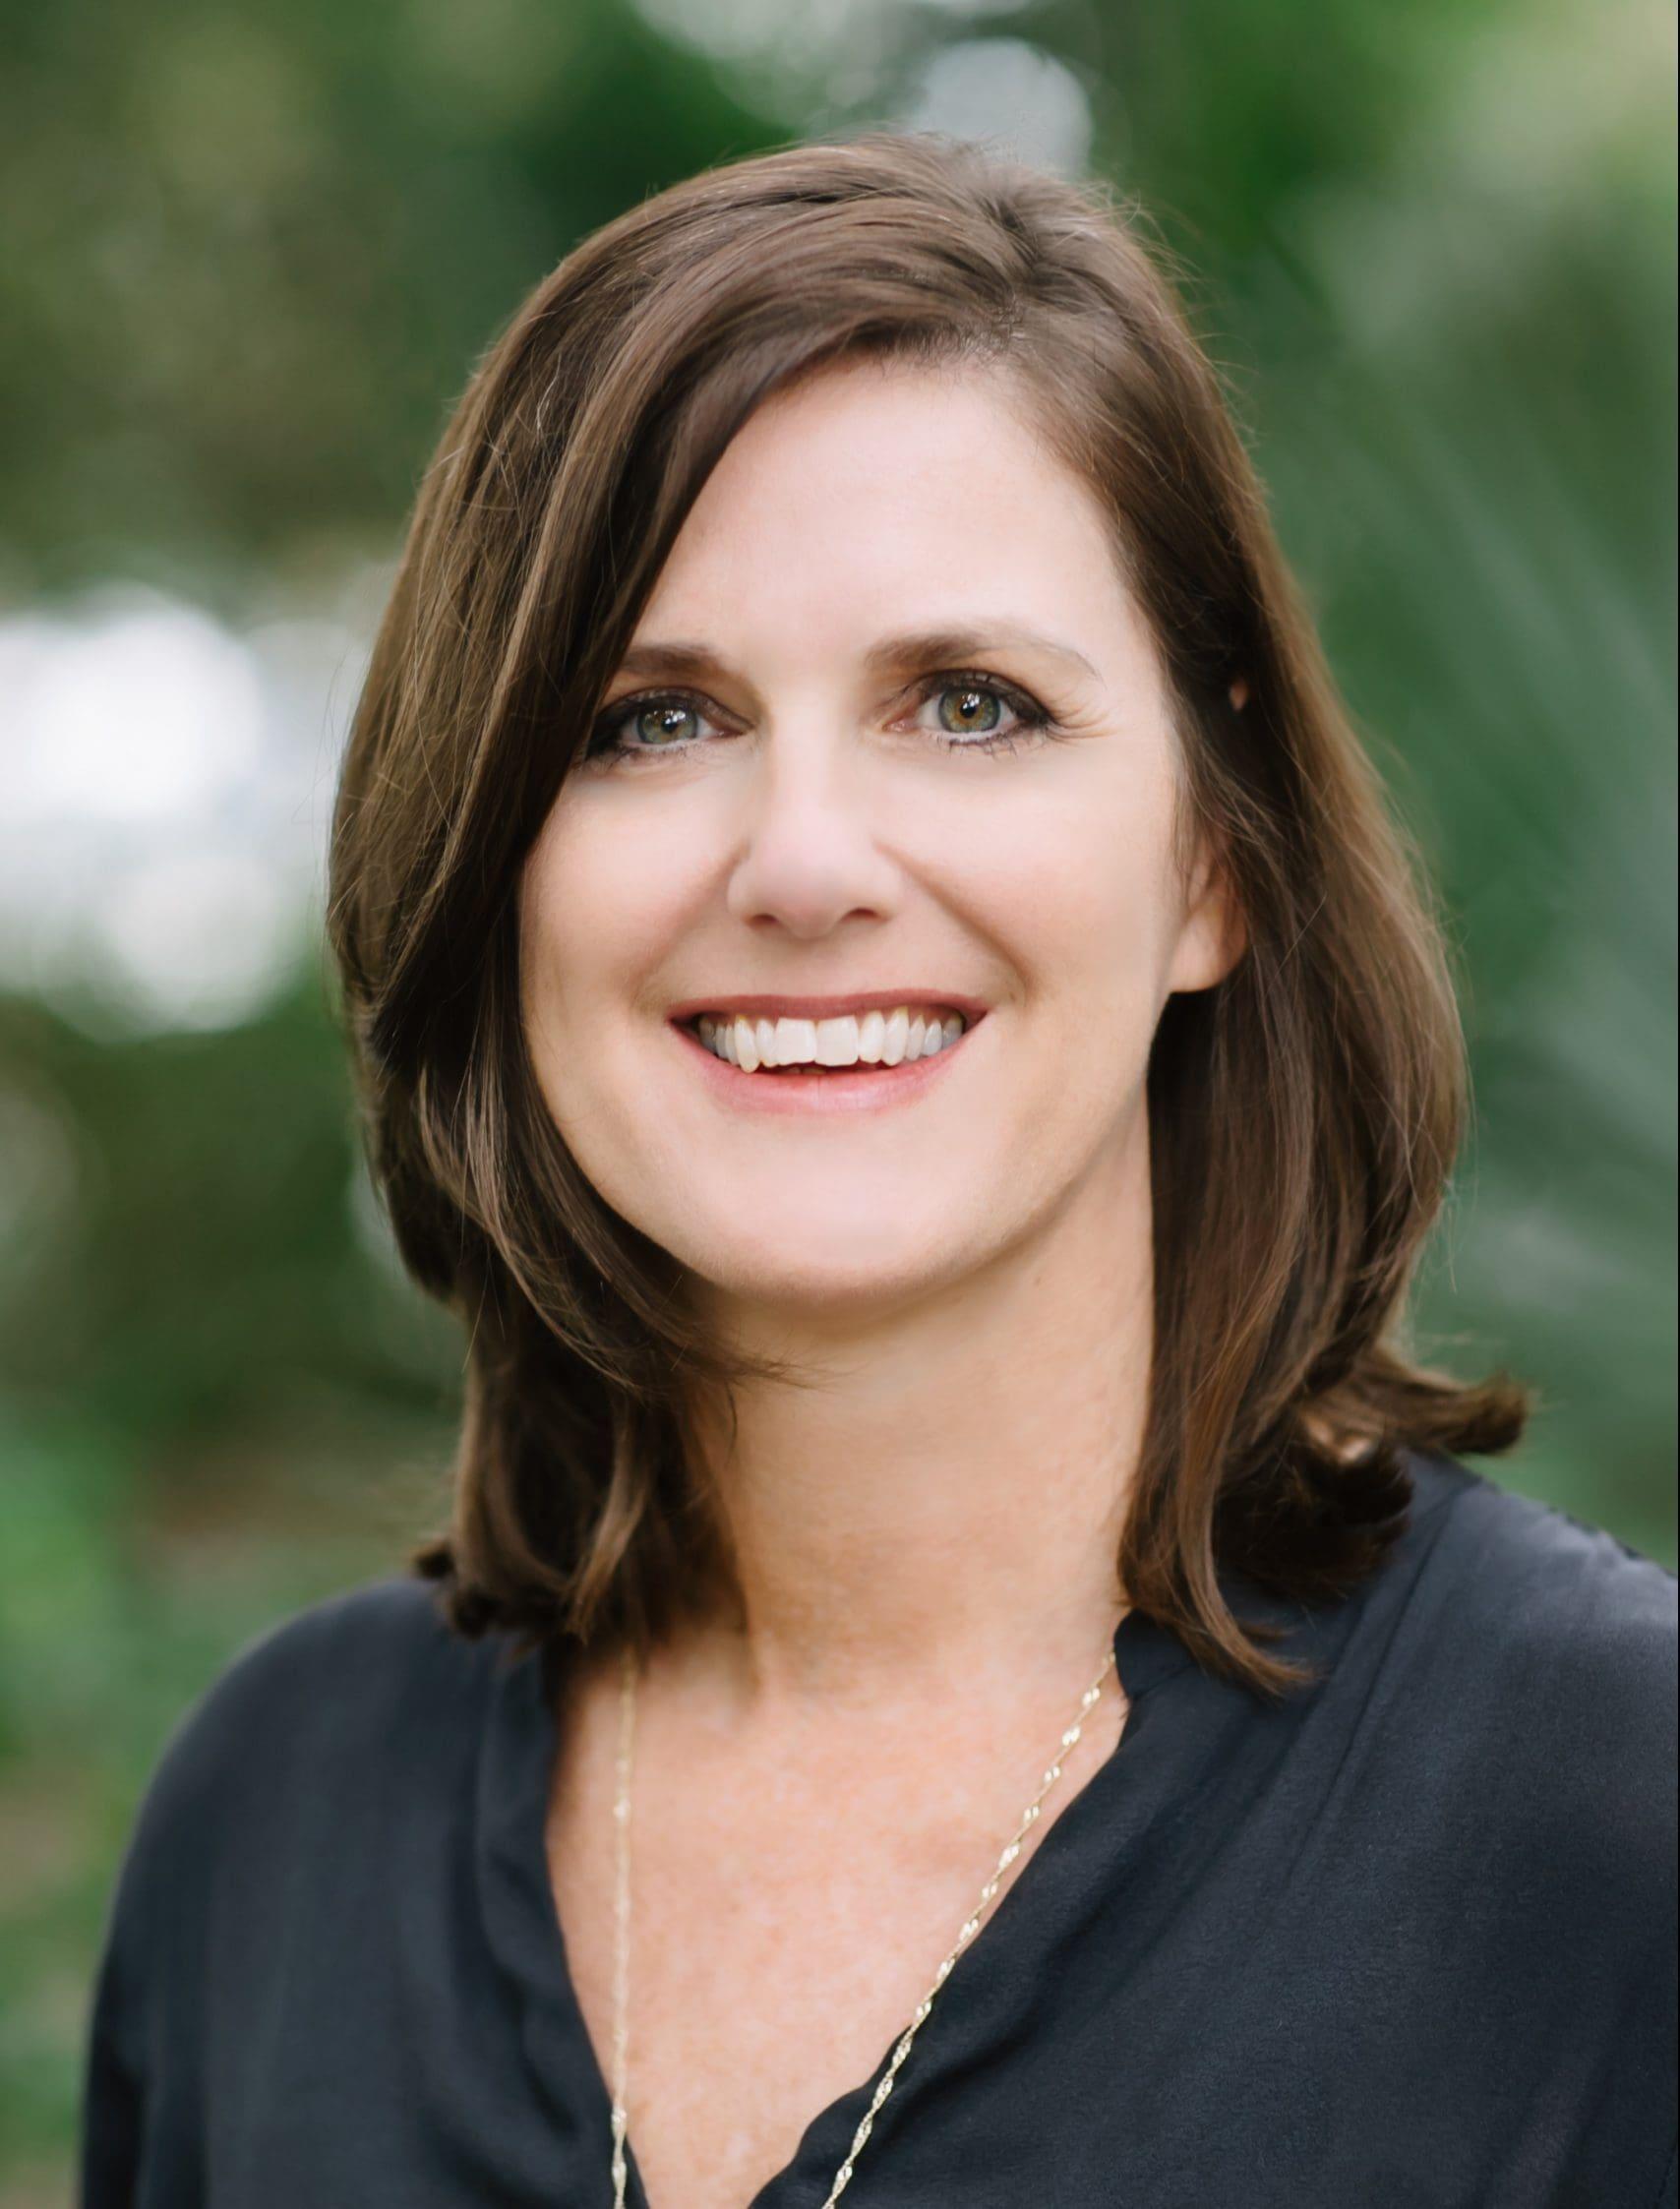 Susan Sherry